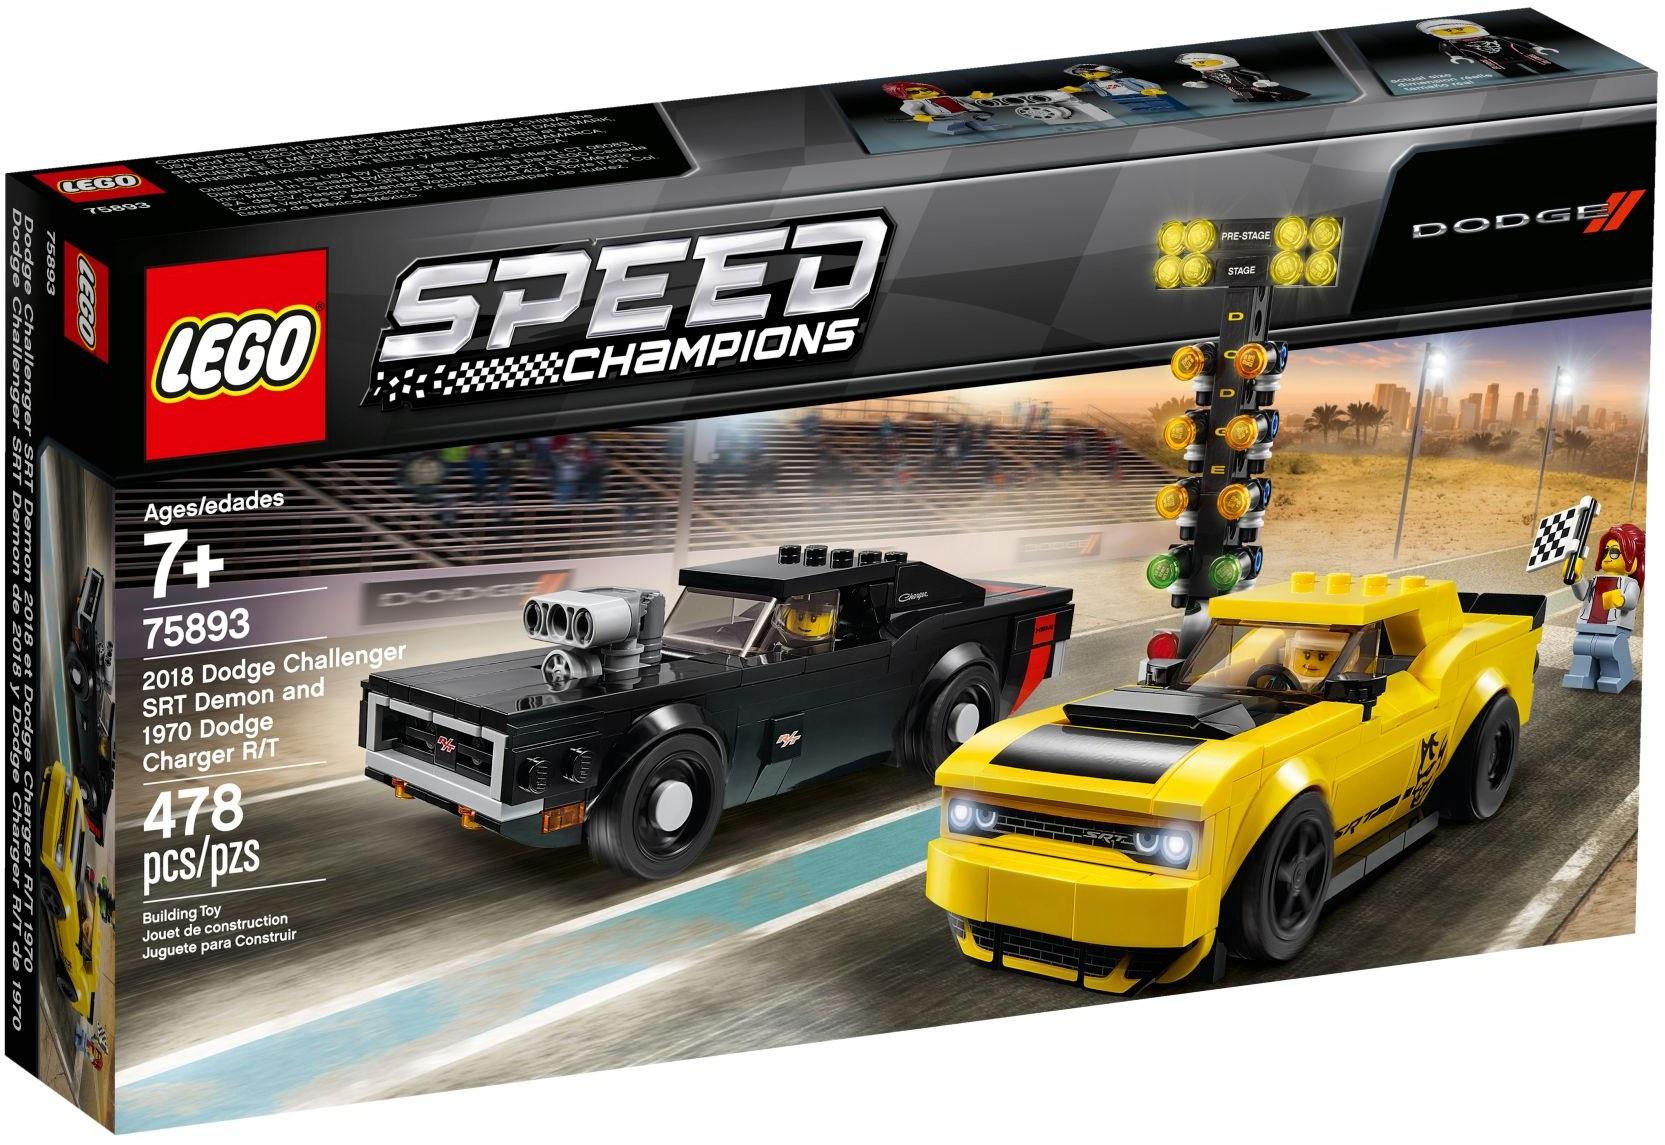 LEGO DODGE 2018 CHALLENGER HELLCAT & HOT ROD - 75893